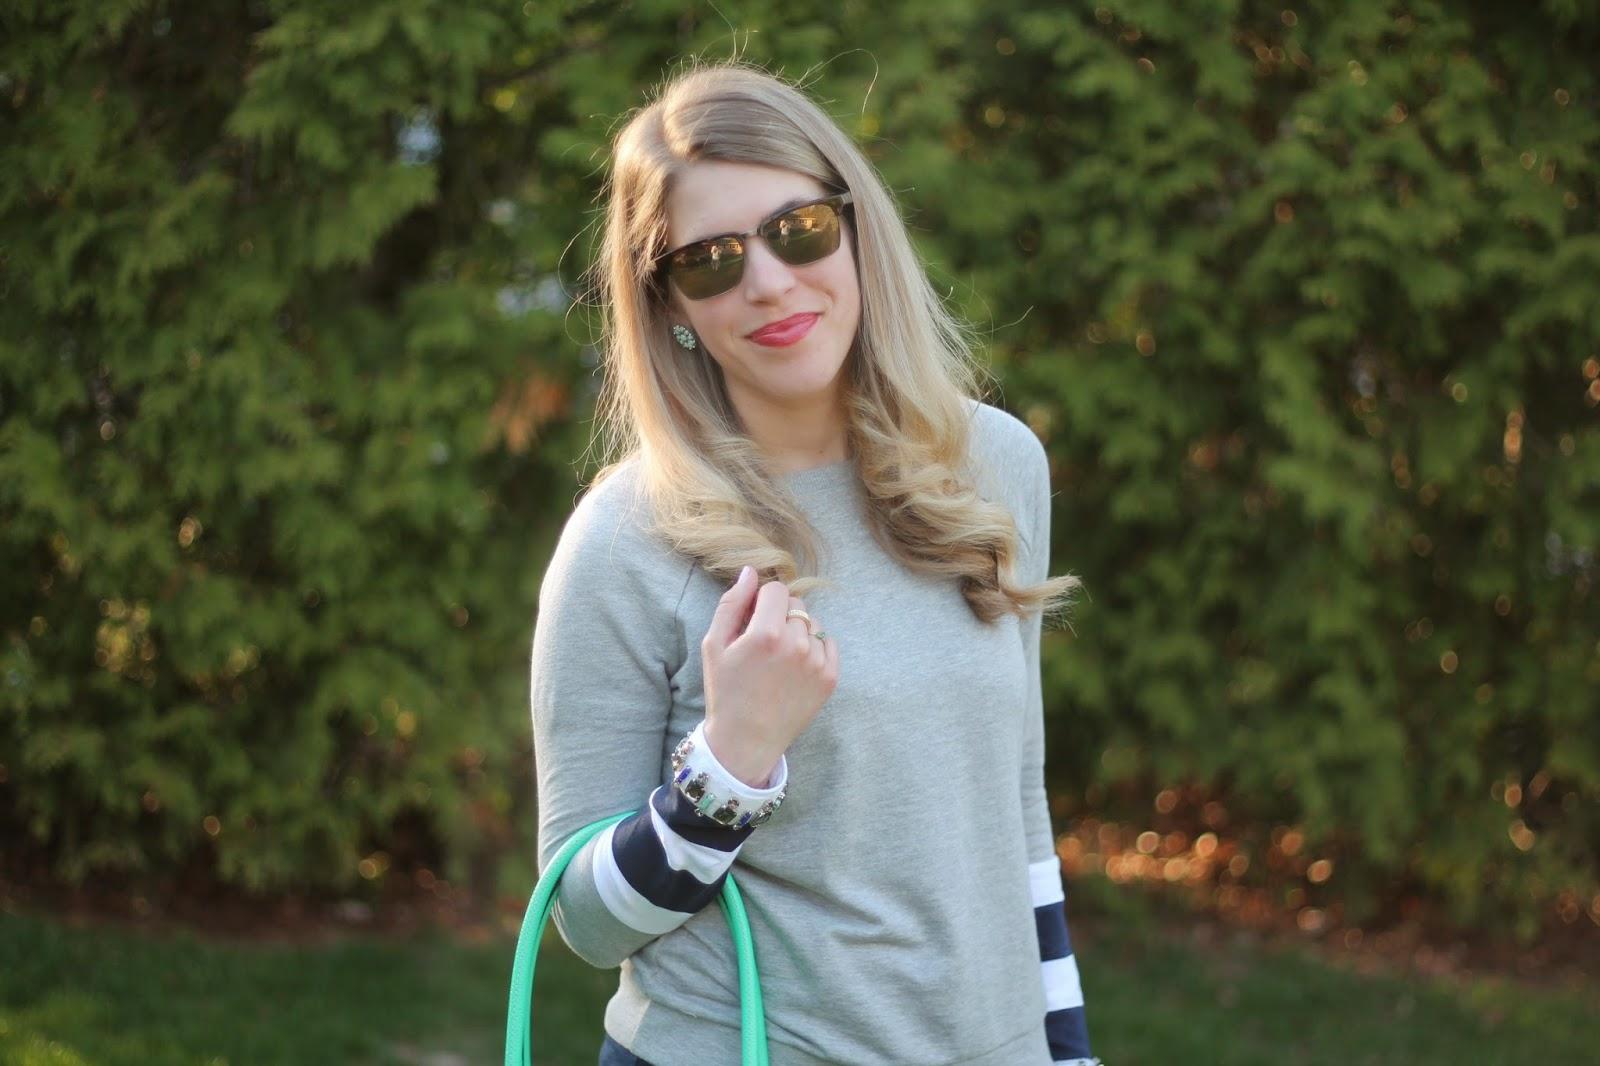 jewel embellished grey sweatshirt, green jeans, striped flats, mint kate spade bag